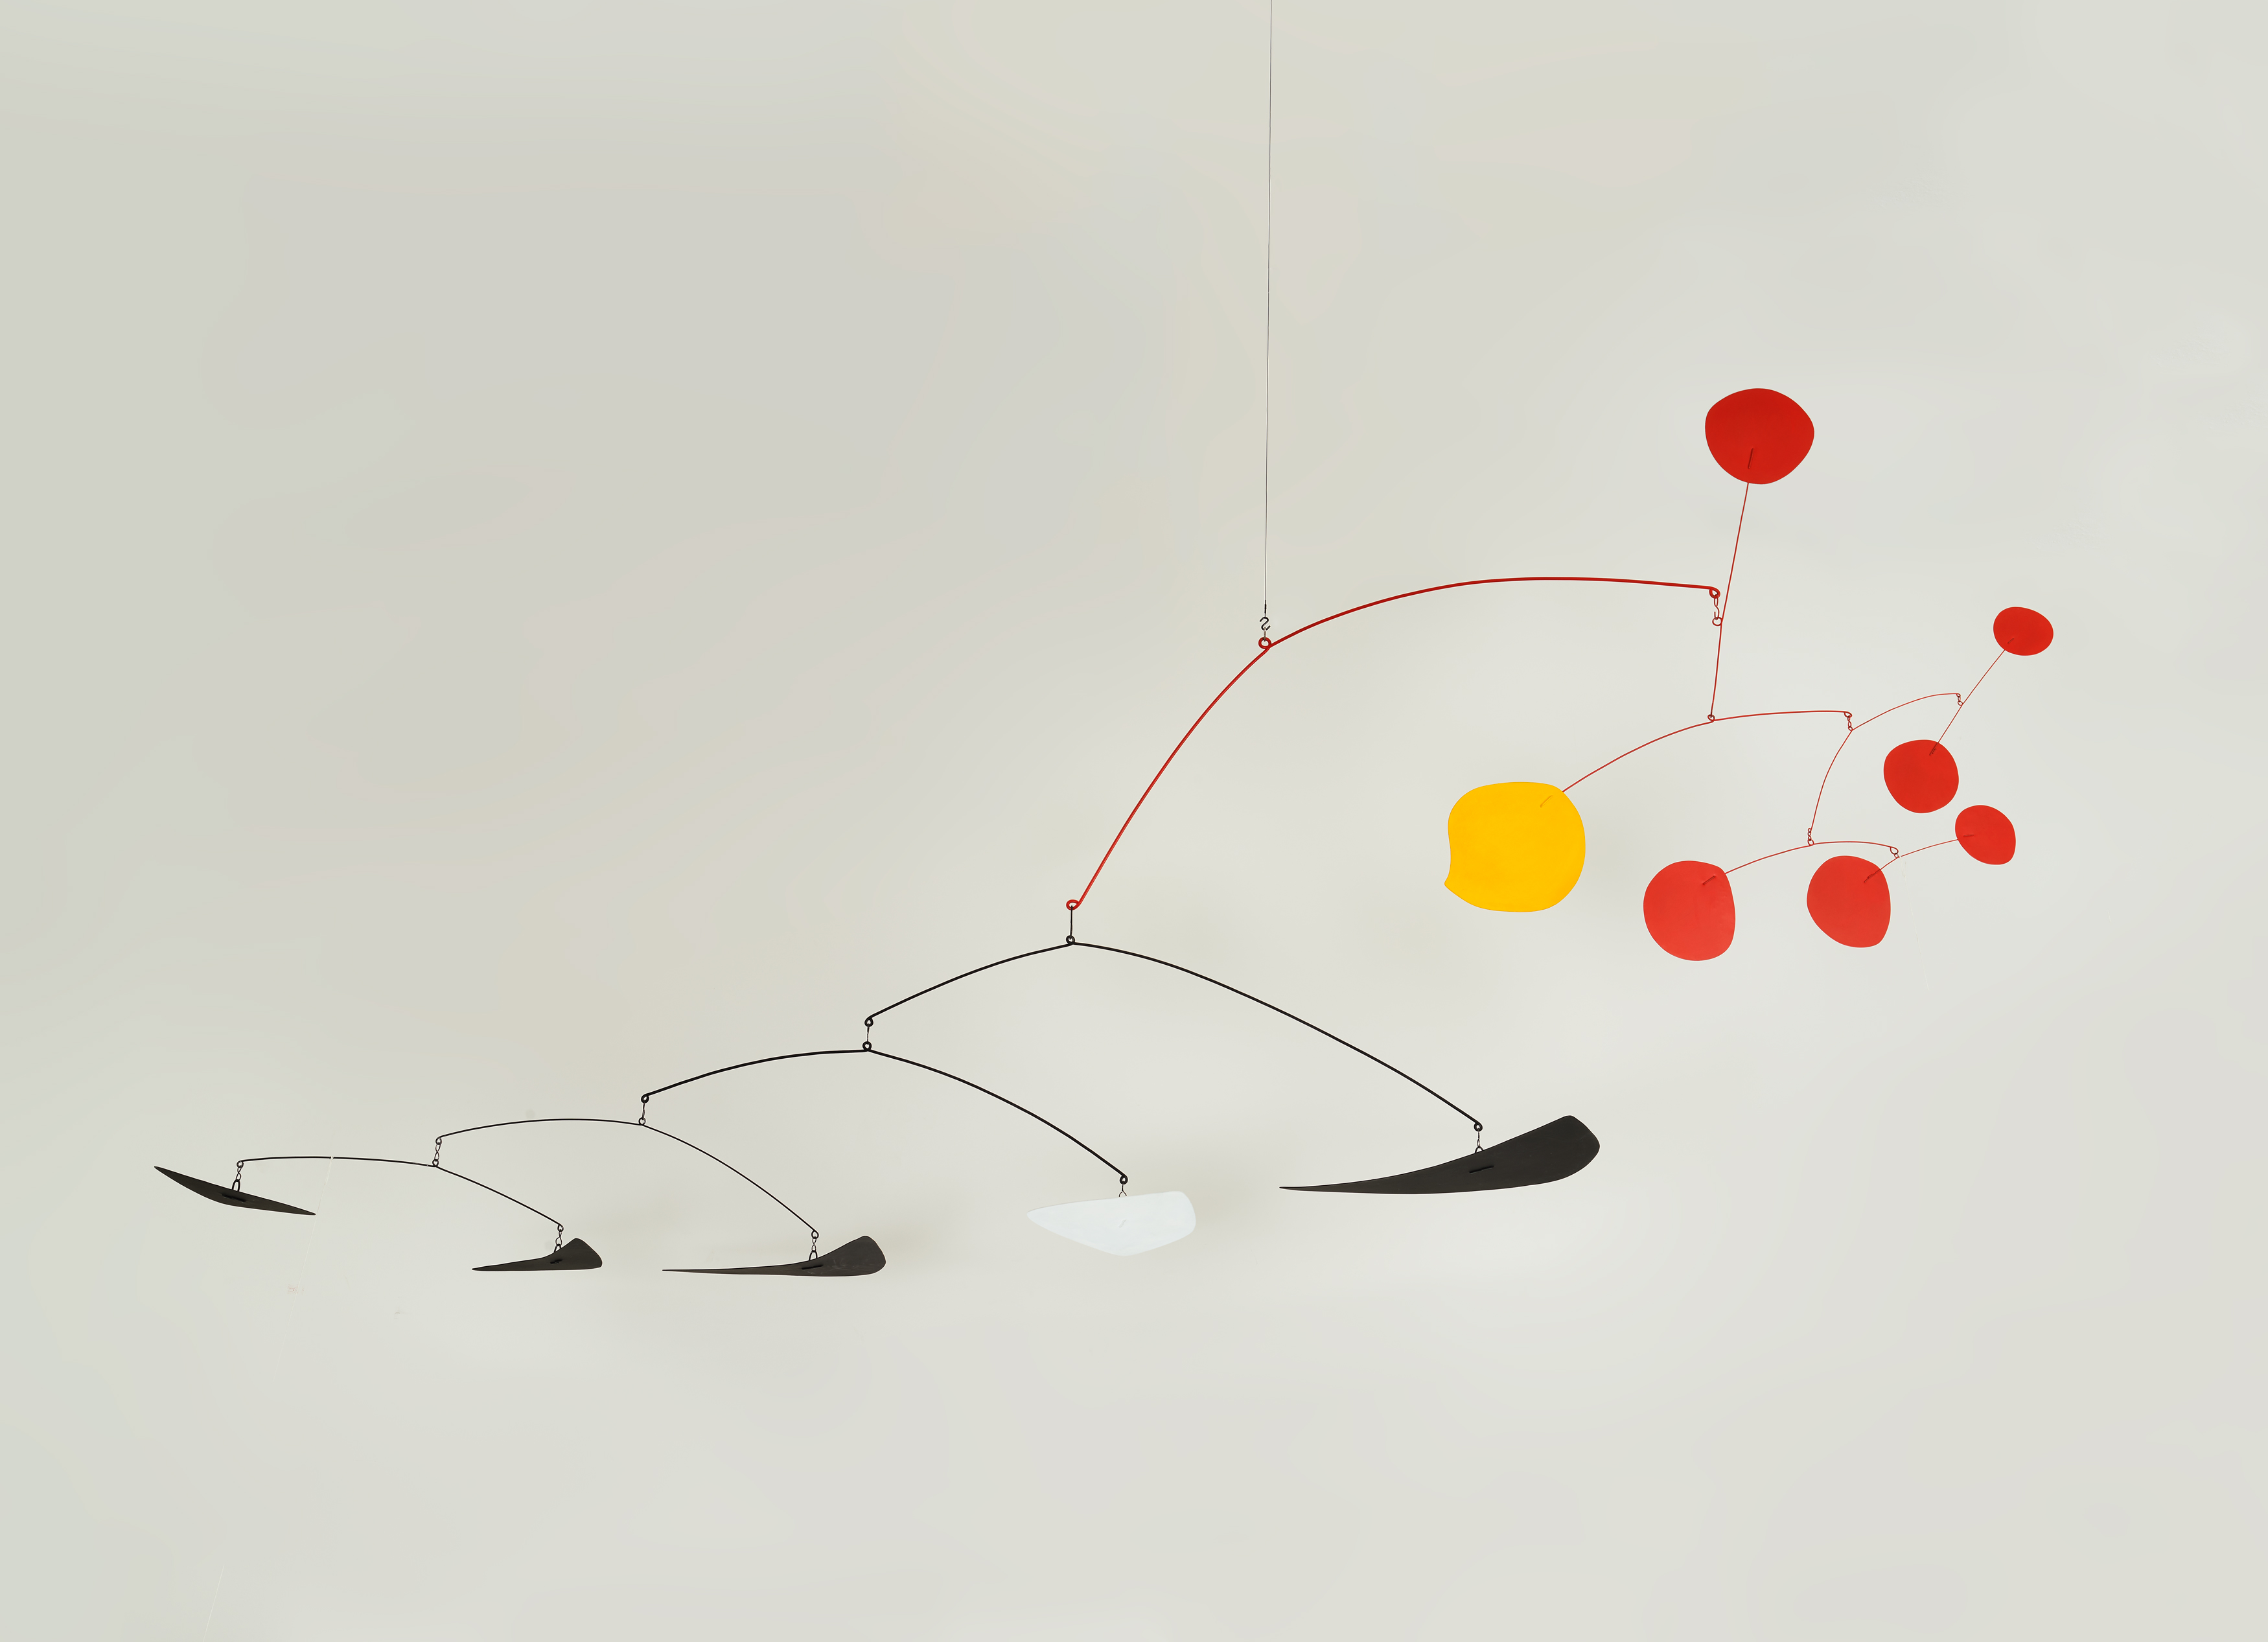 Alexander Calder. Guava, 1955 © 2019 Calder Foundation, New York / VEGAP, Santander. Photo: Tom Powel Imaging